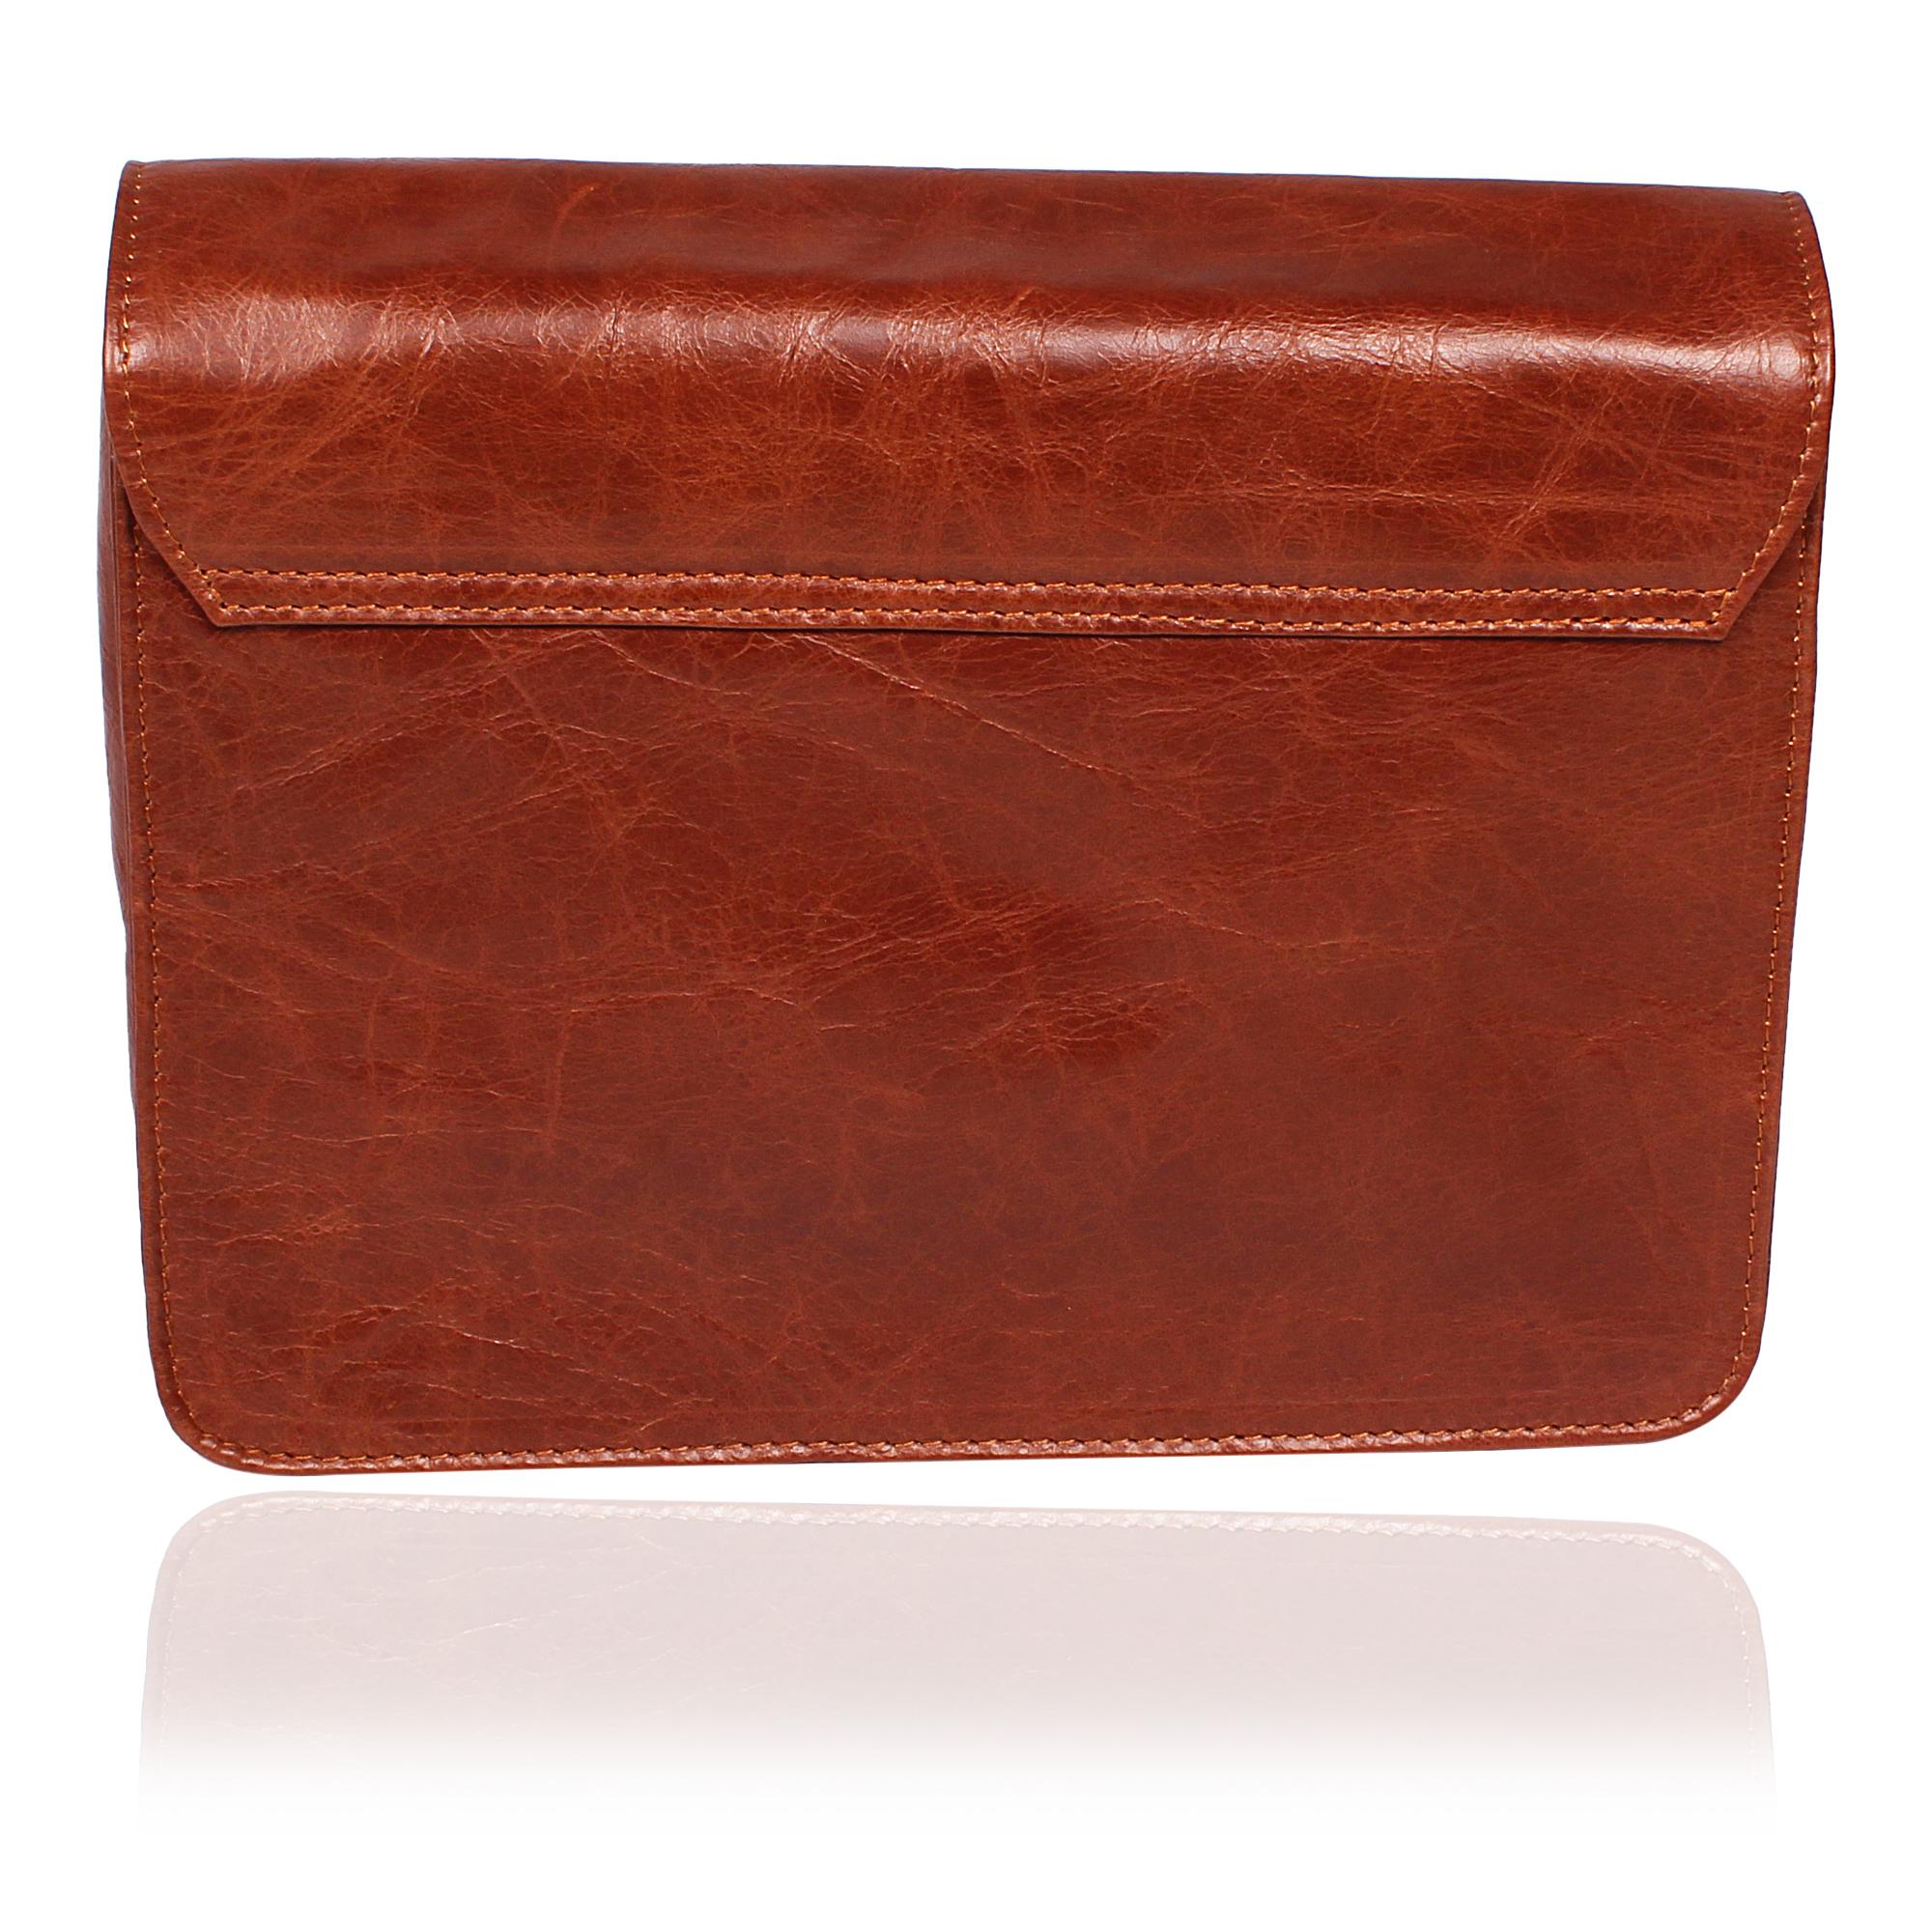 Classic Leather Clutch